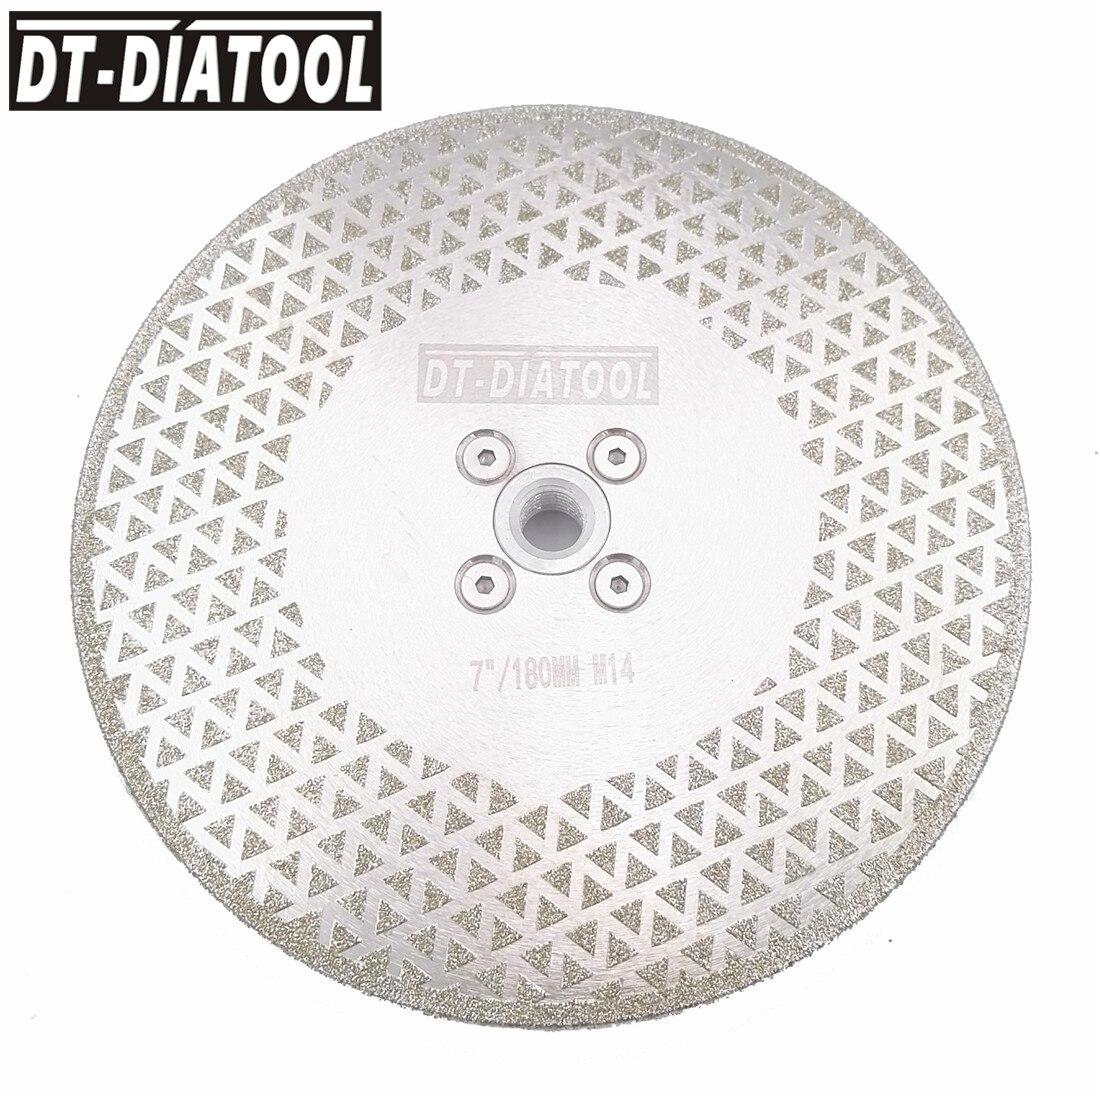 DT-DIATOOL 1pc M14 Flange Dia 7